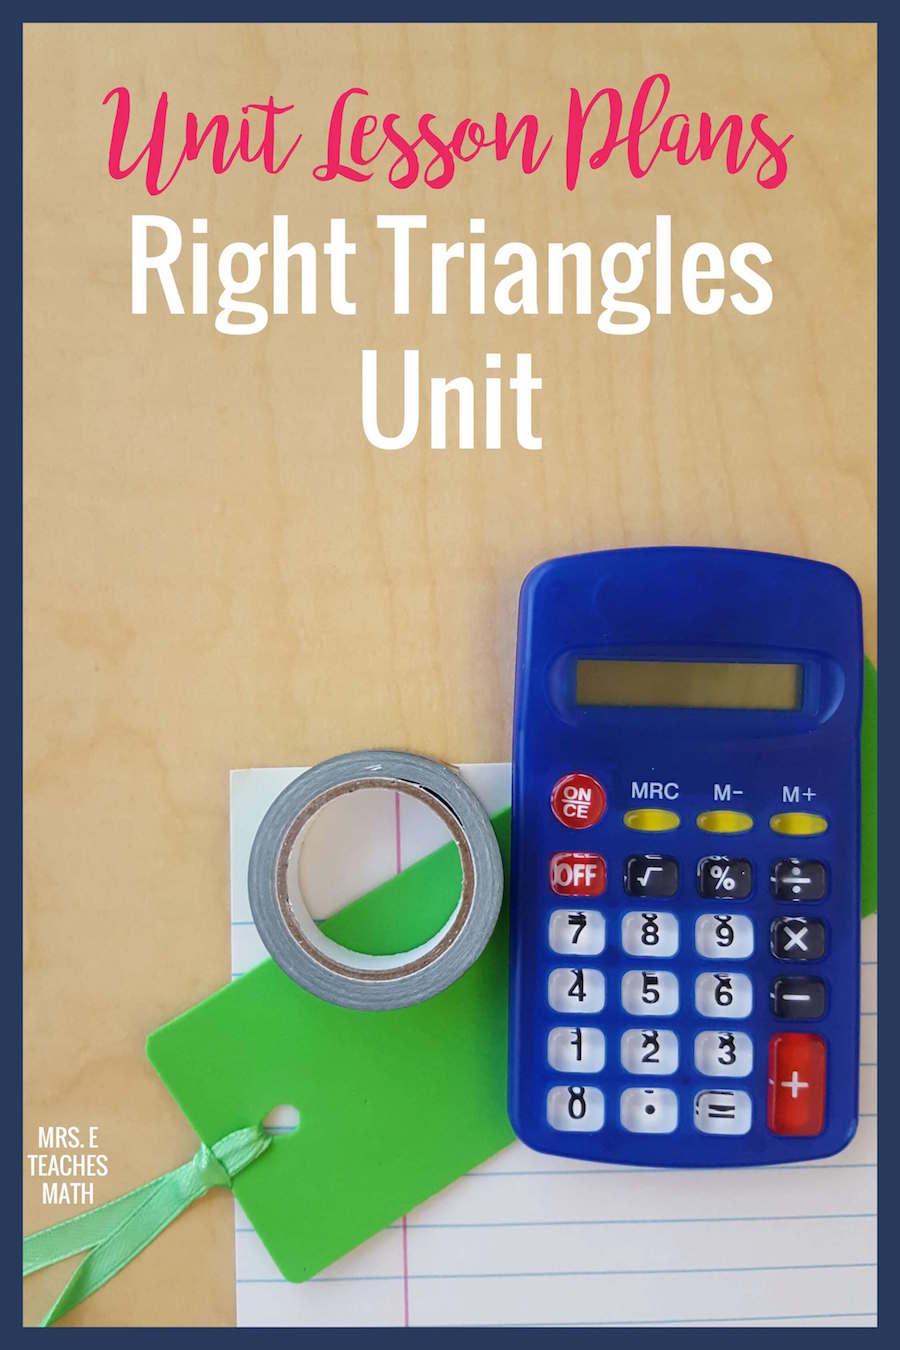 Right Triangles Unit | Mrs. E Teaches Math